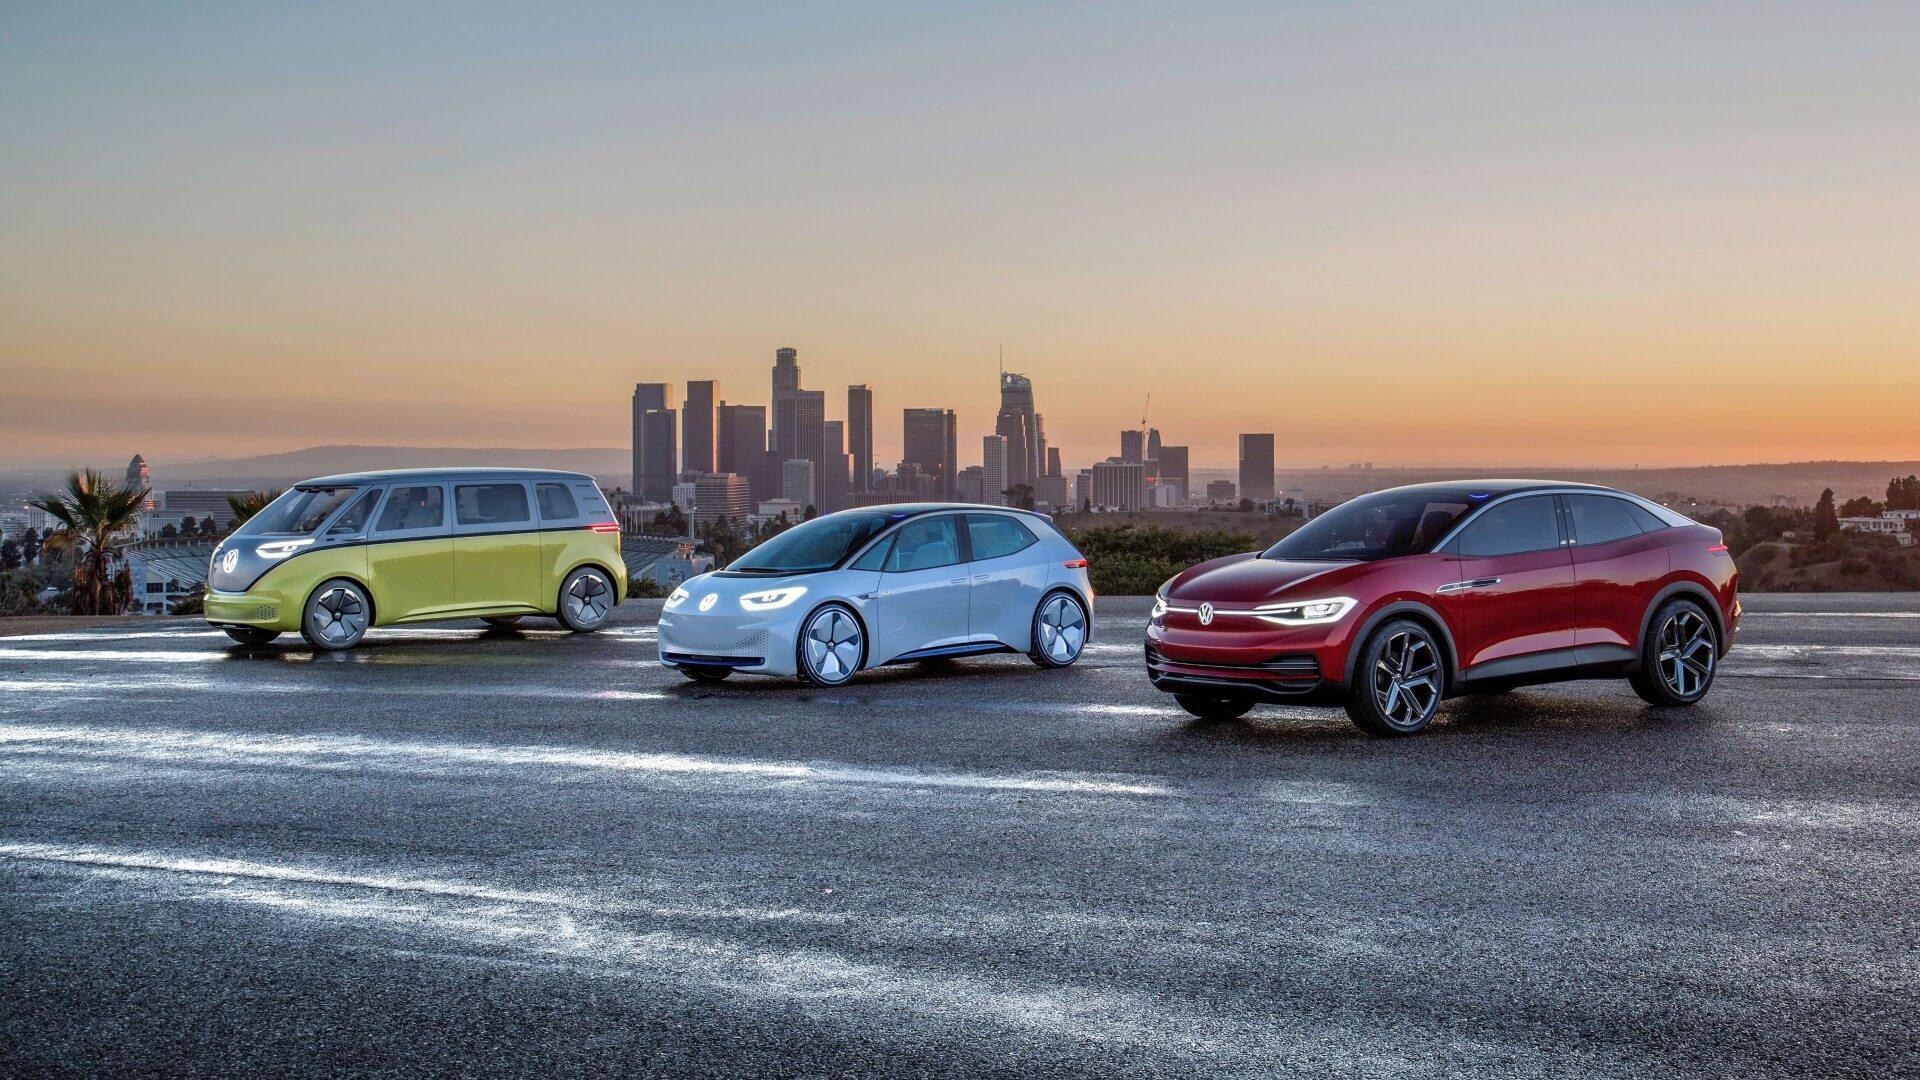 Электромобили Volkswagen из серии I.D. намодульной платформе MEB